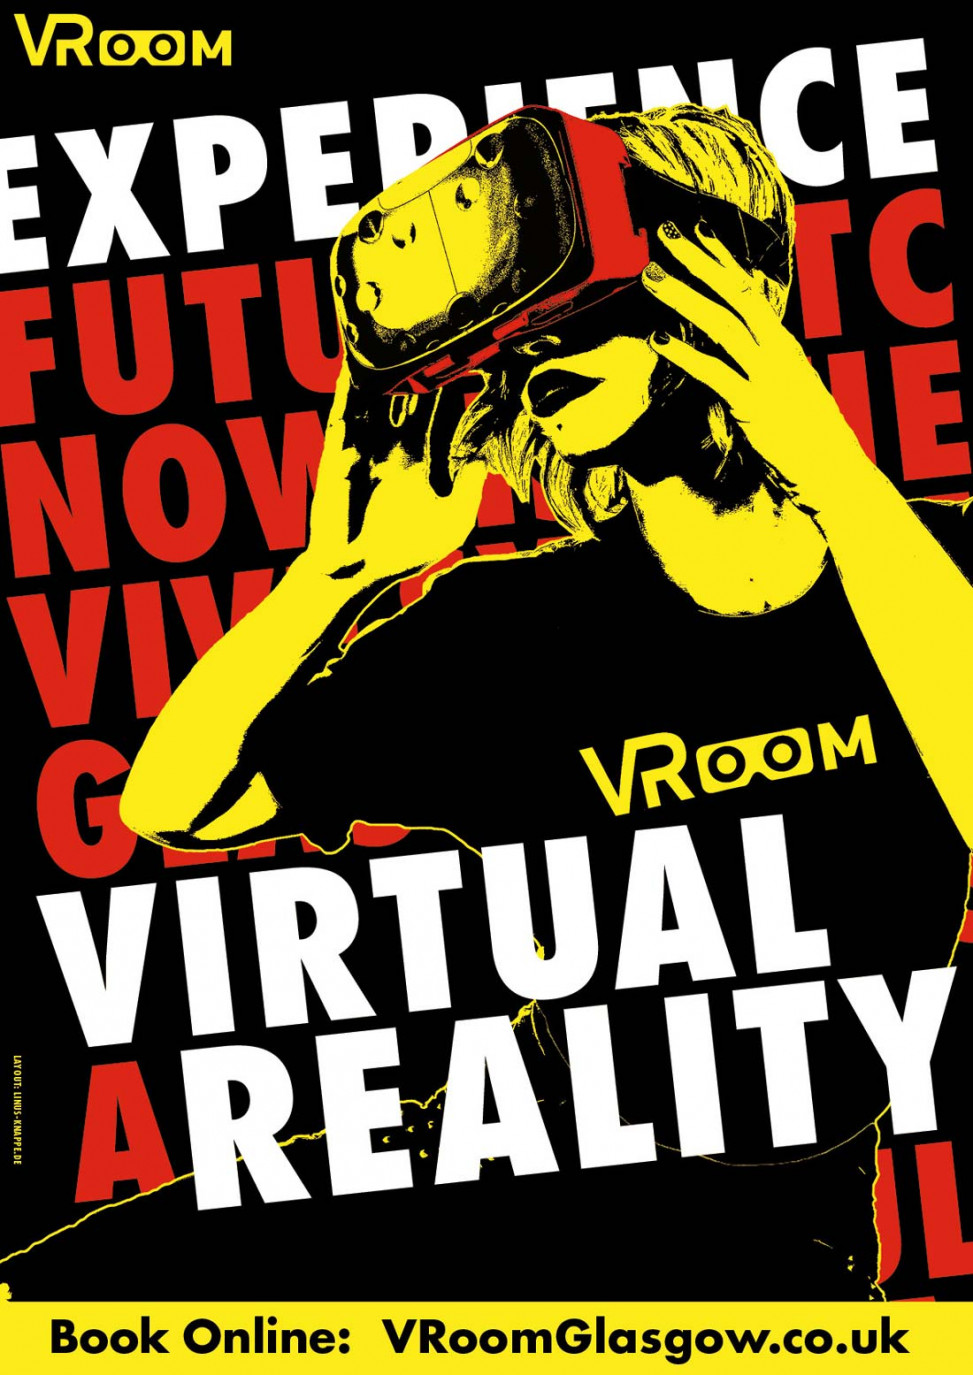 VRoom-Plakat-2018